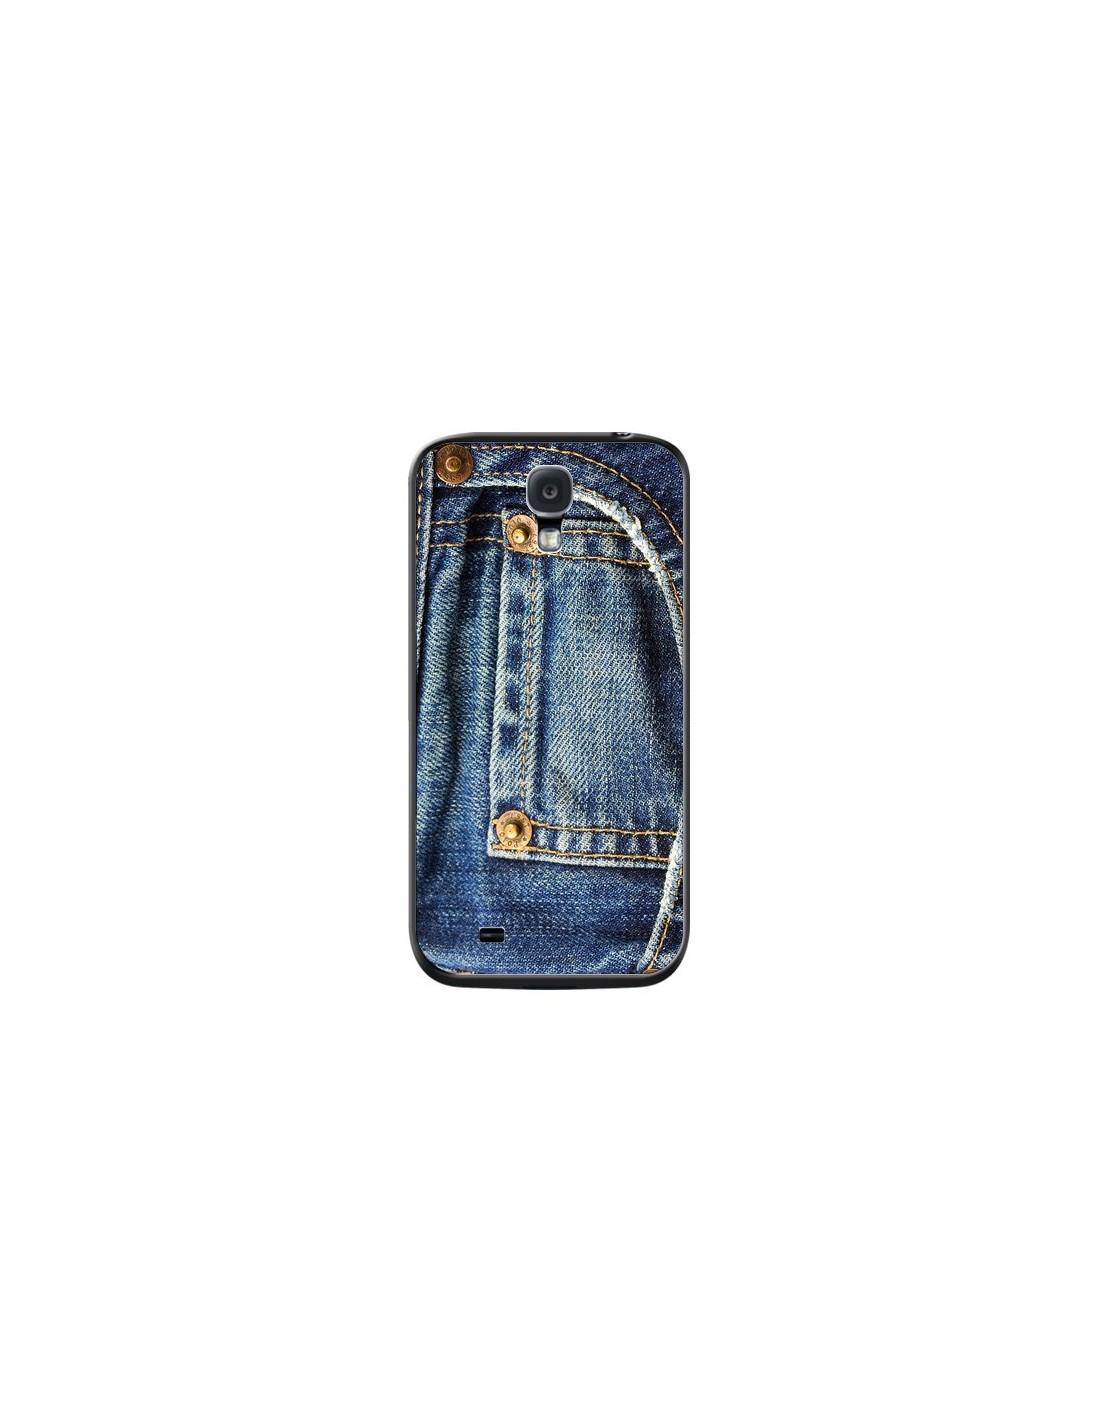 Coque Jean Bleu Vintage pour Samsung Galaxy S4 - Laetitia